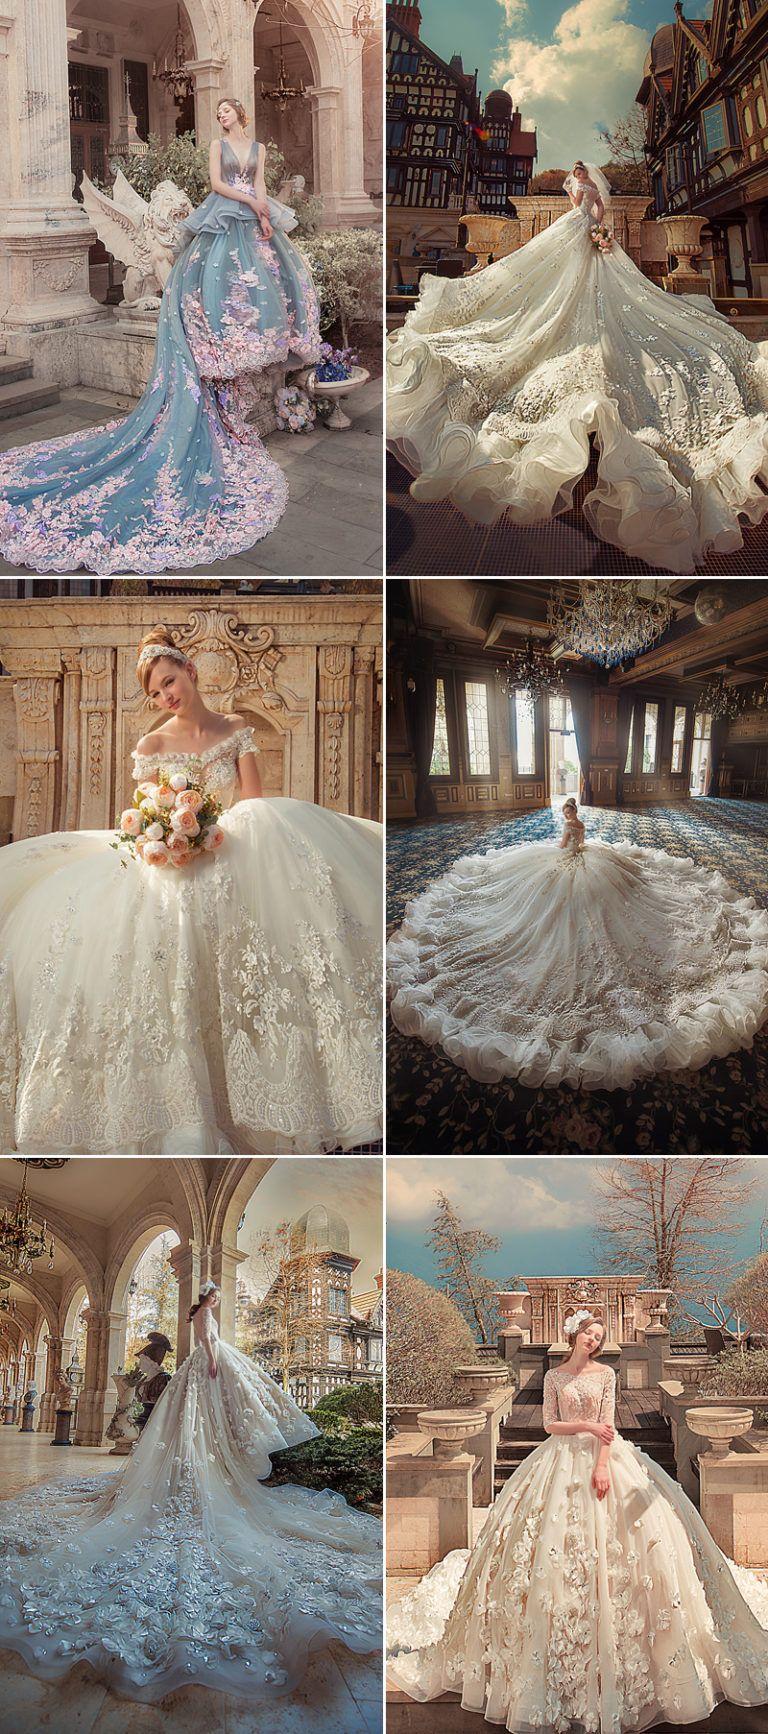 Ksl wedding dress  Make a Romantic Regal Statement  PrincessWorthy Wedding Gowns